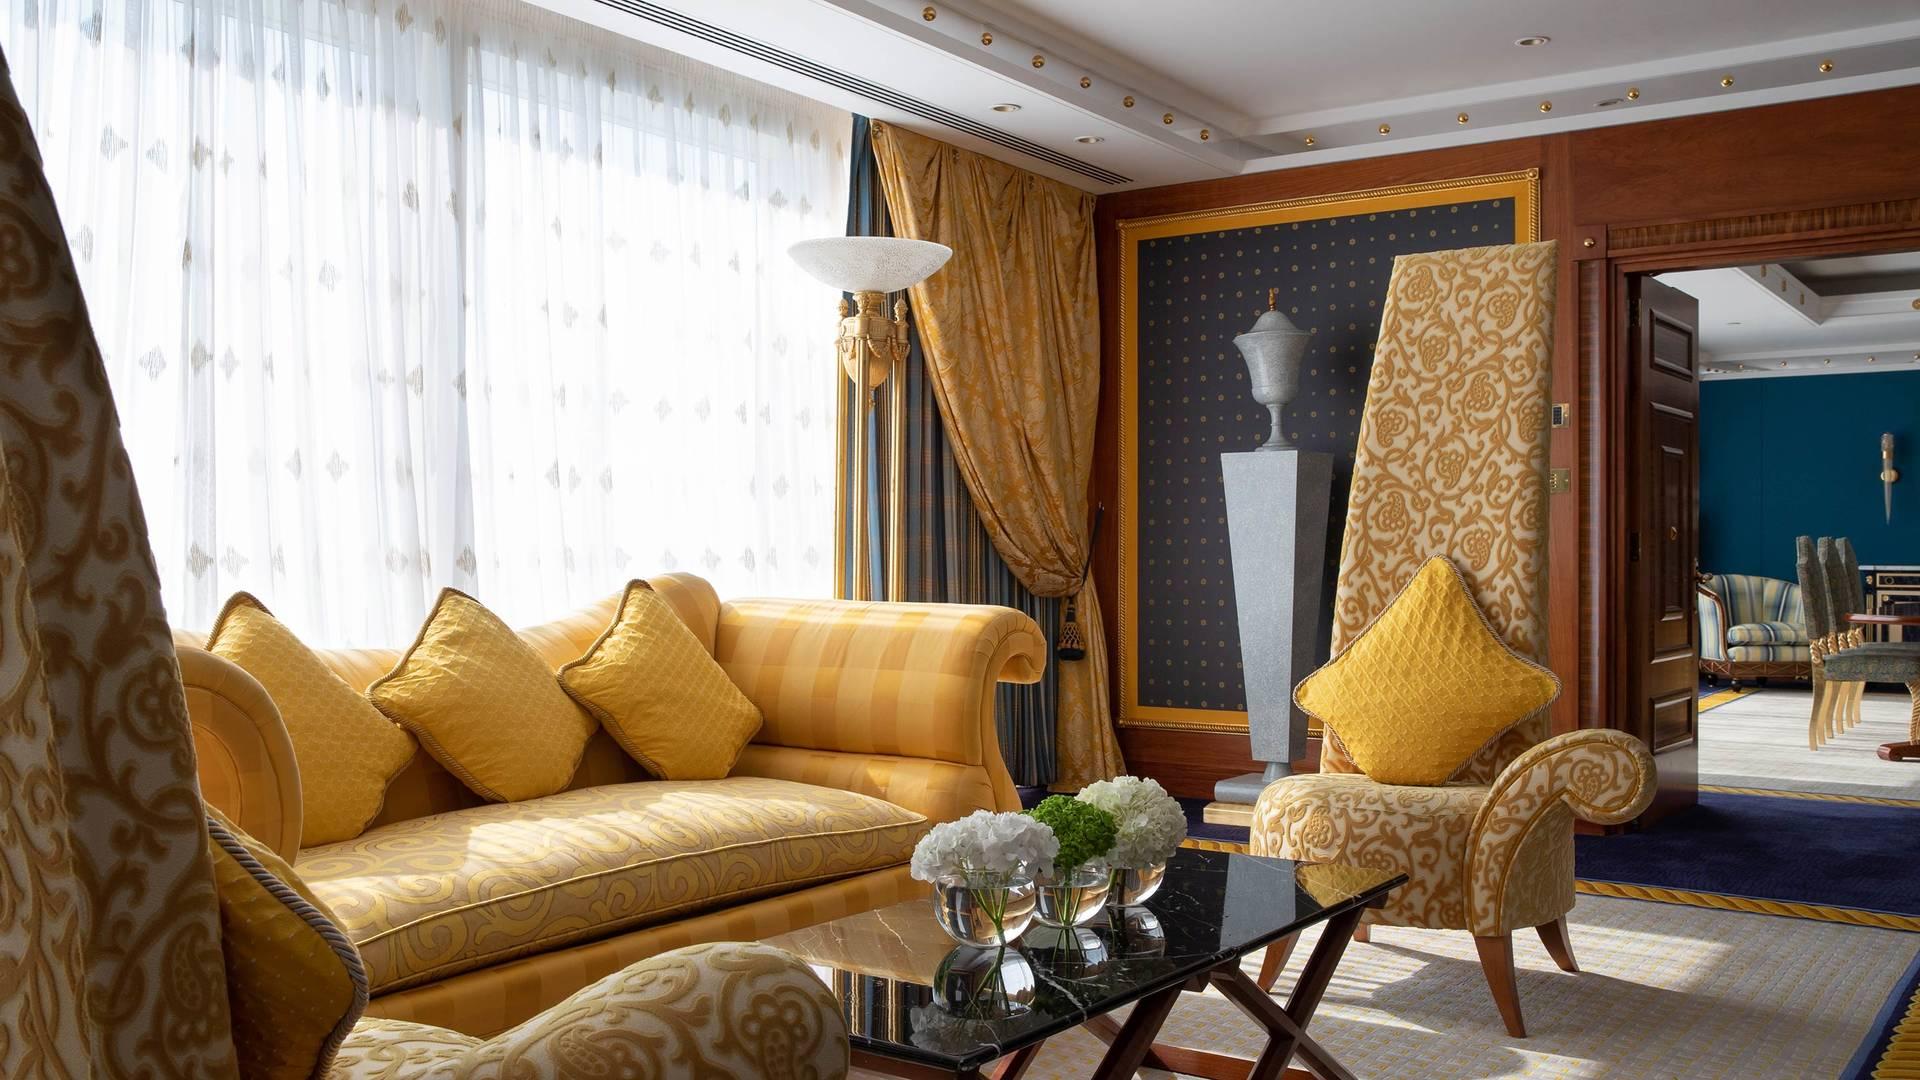 Jumeirah Burj Al Arab Presidential suite living room detail_16-9